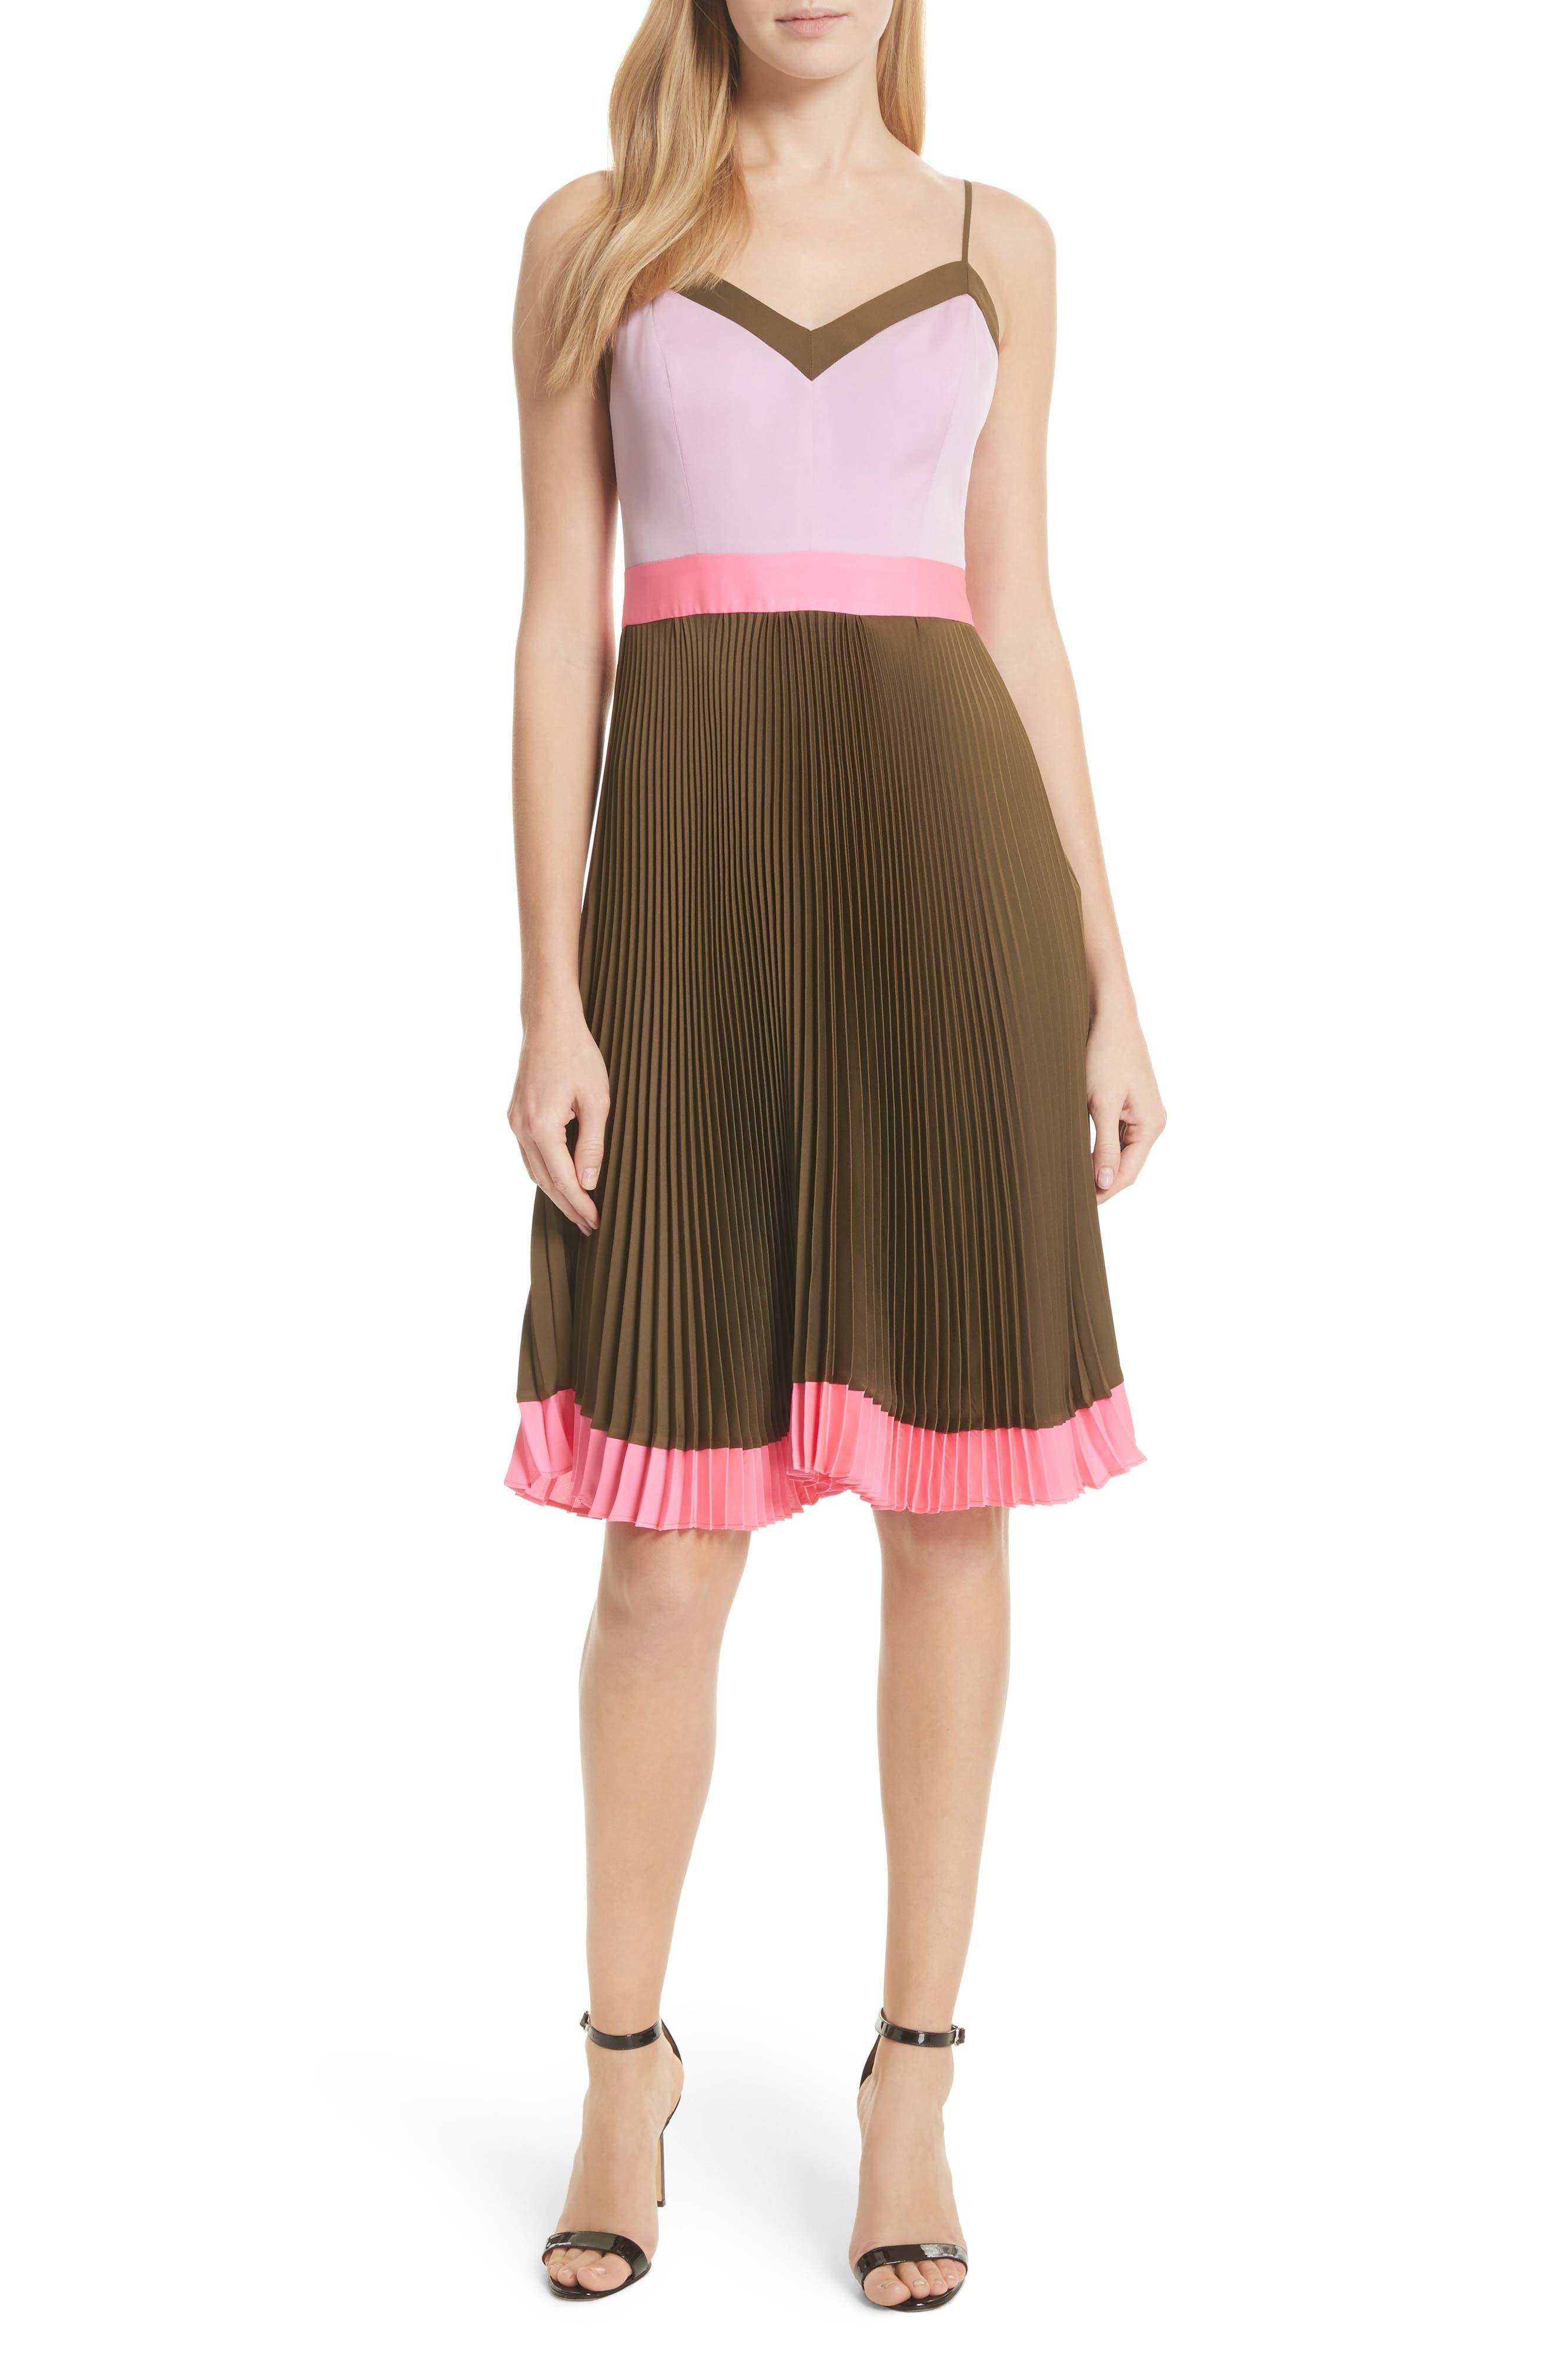 Jill Pleated Stretch Silk Dress,                         Main,                         color, Olive/ Petal/ Fluo Pink